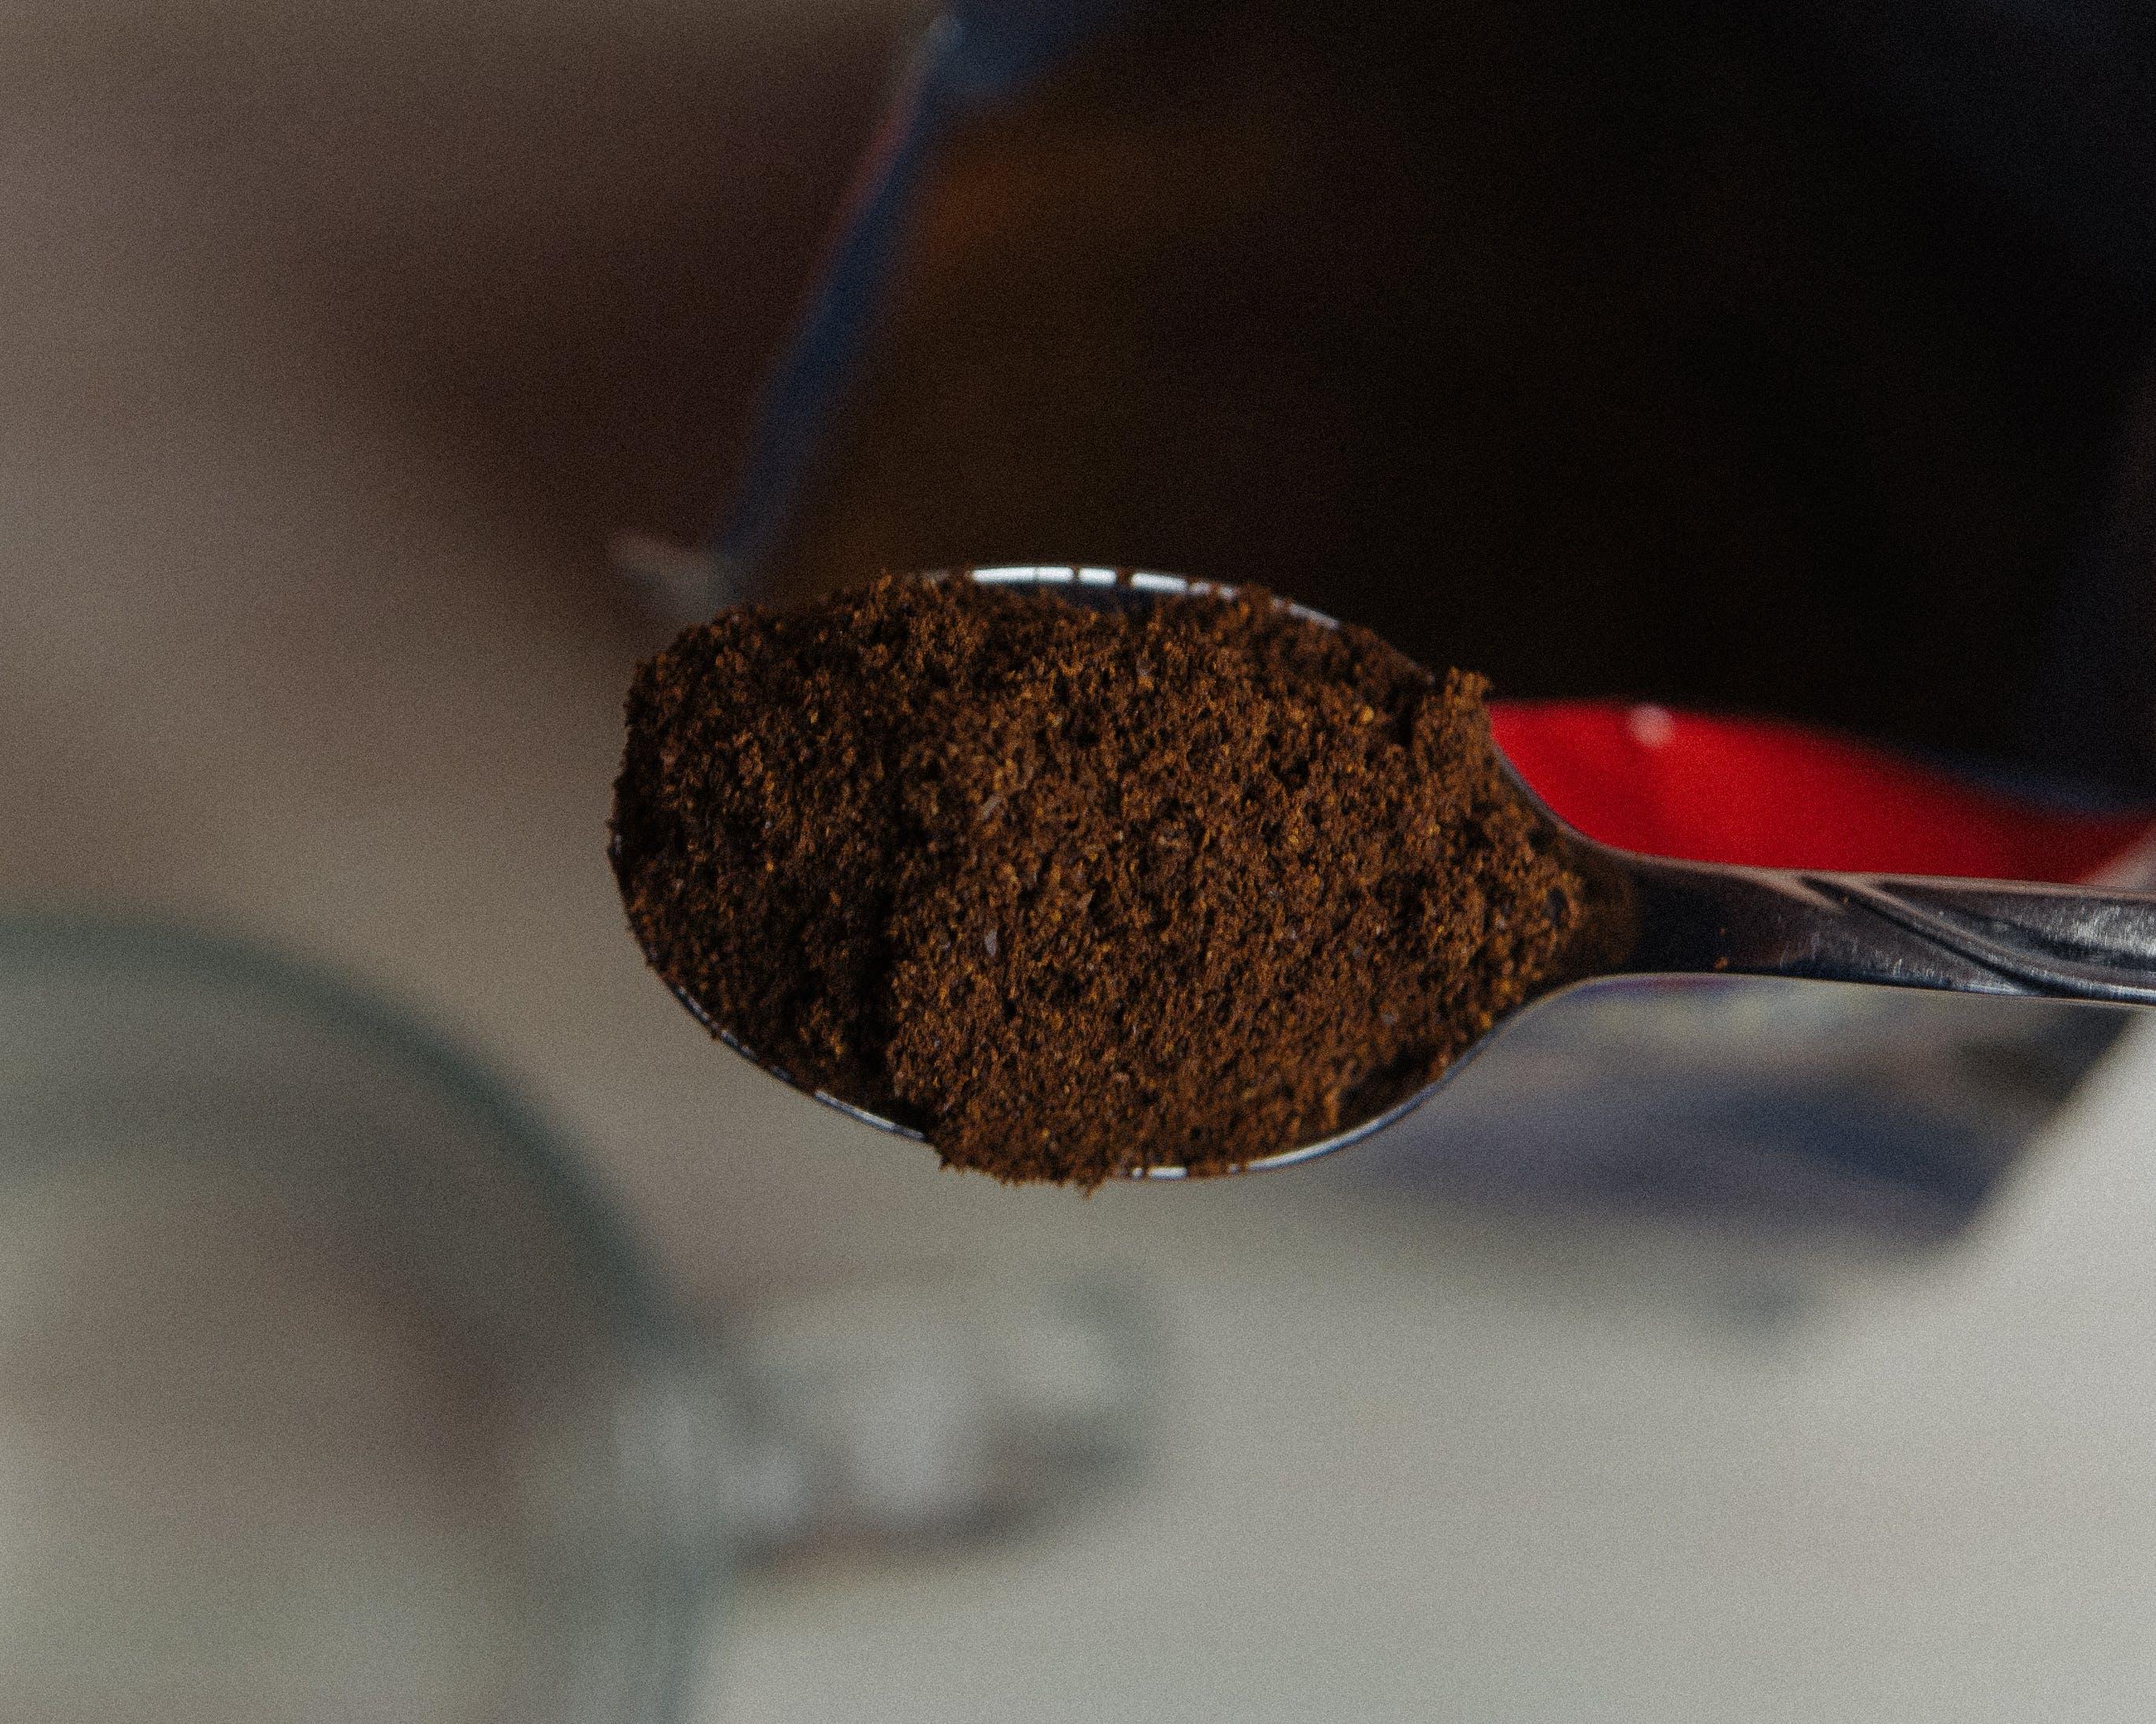 Free stock photo of coffee, café